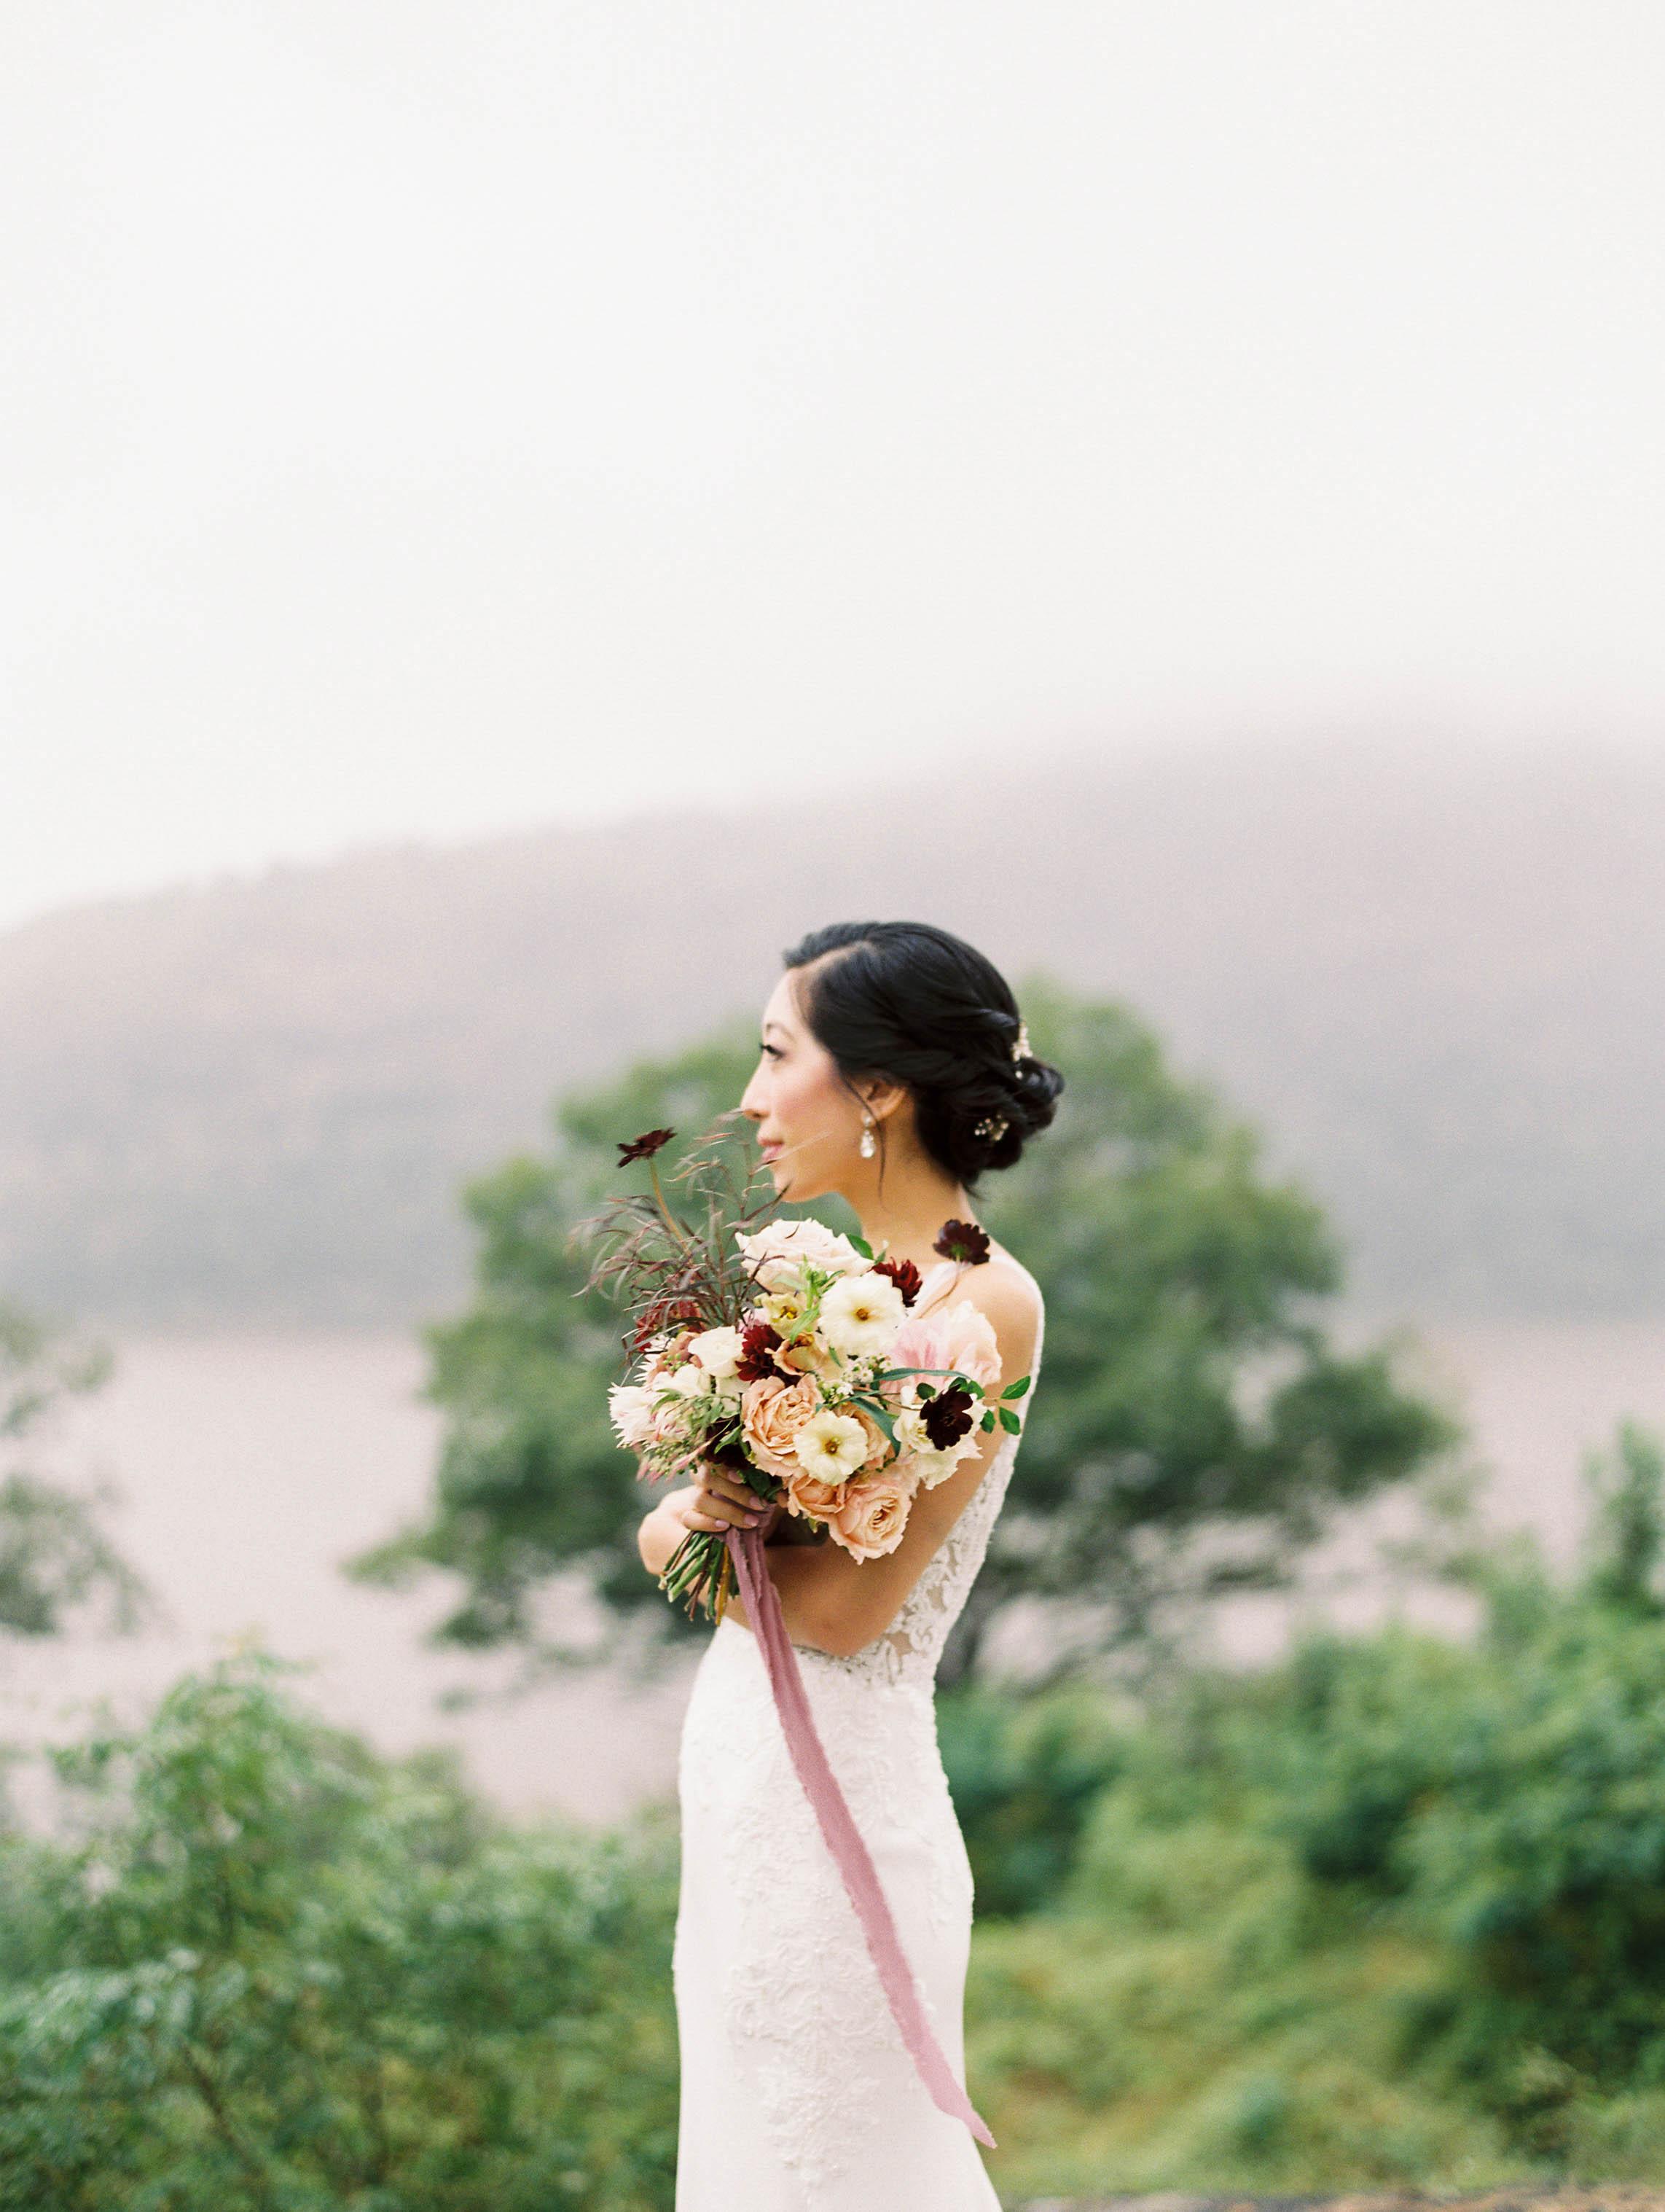 kelsandmichael_weddingphotography_ny-27.jpg